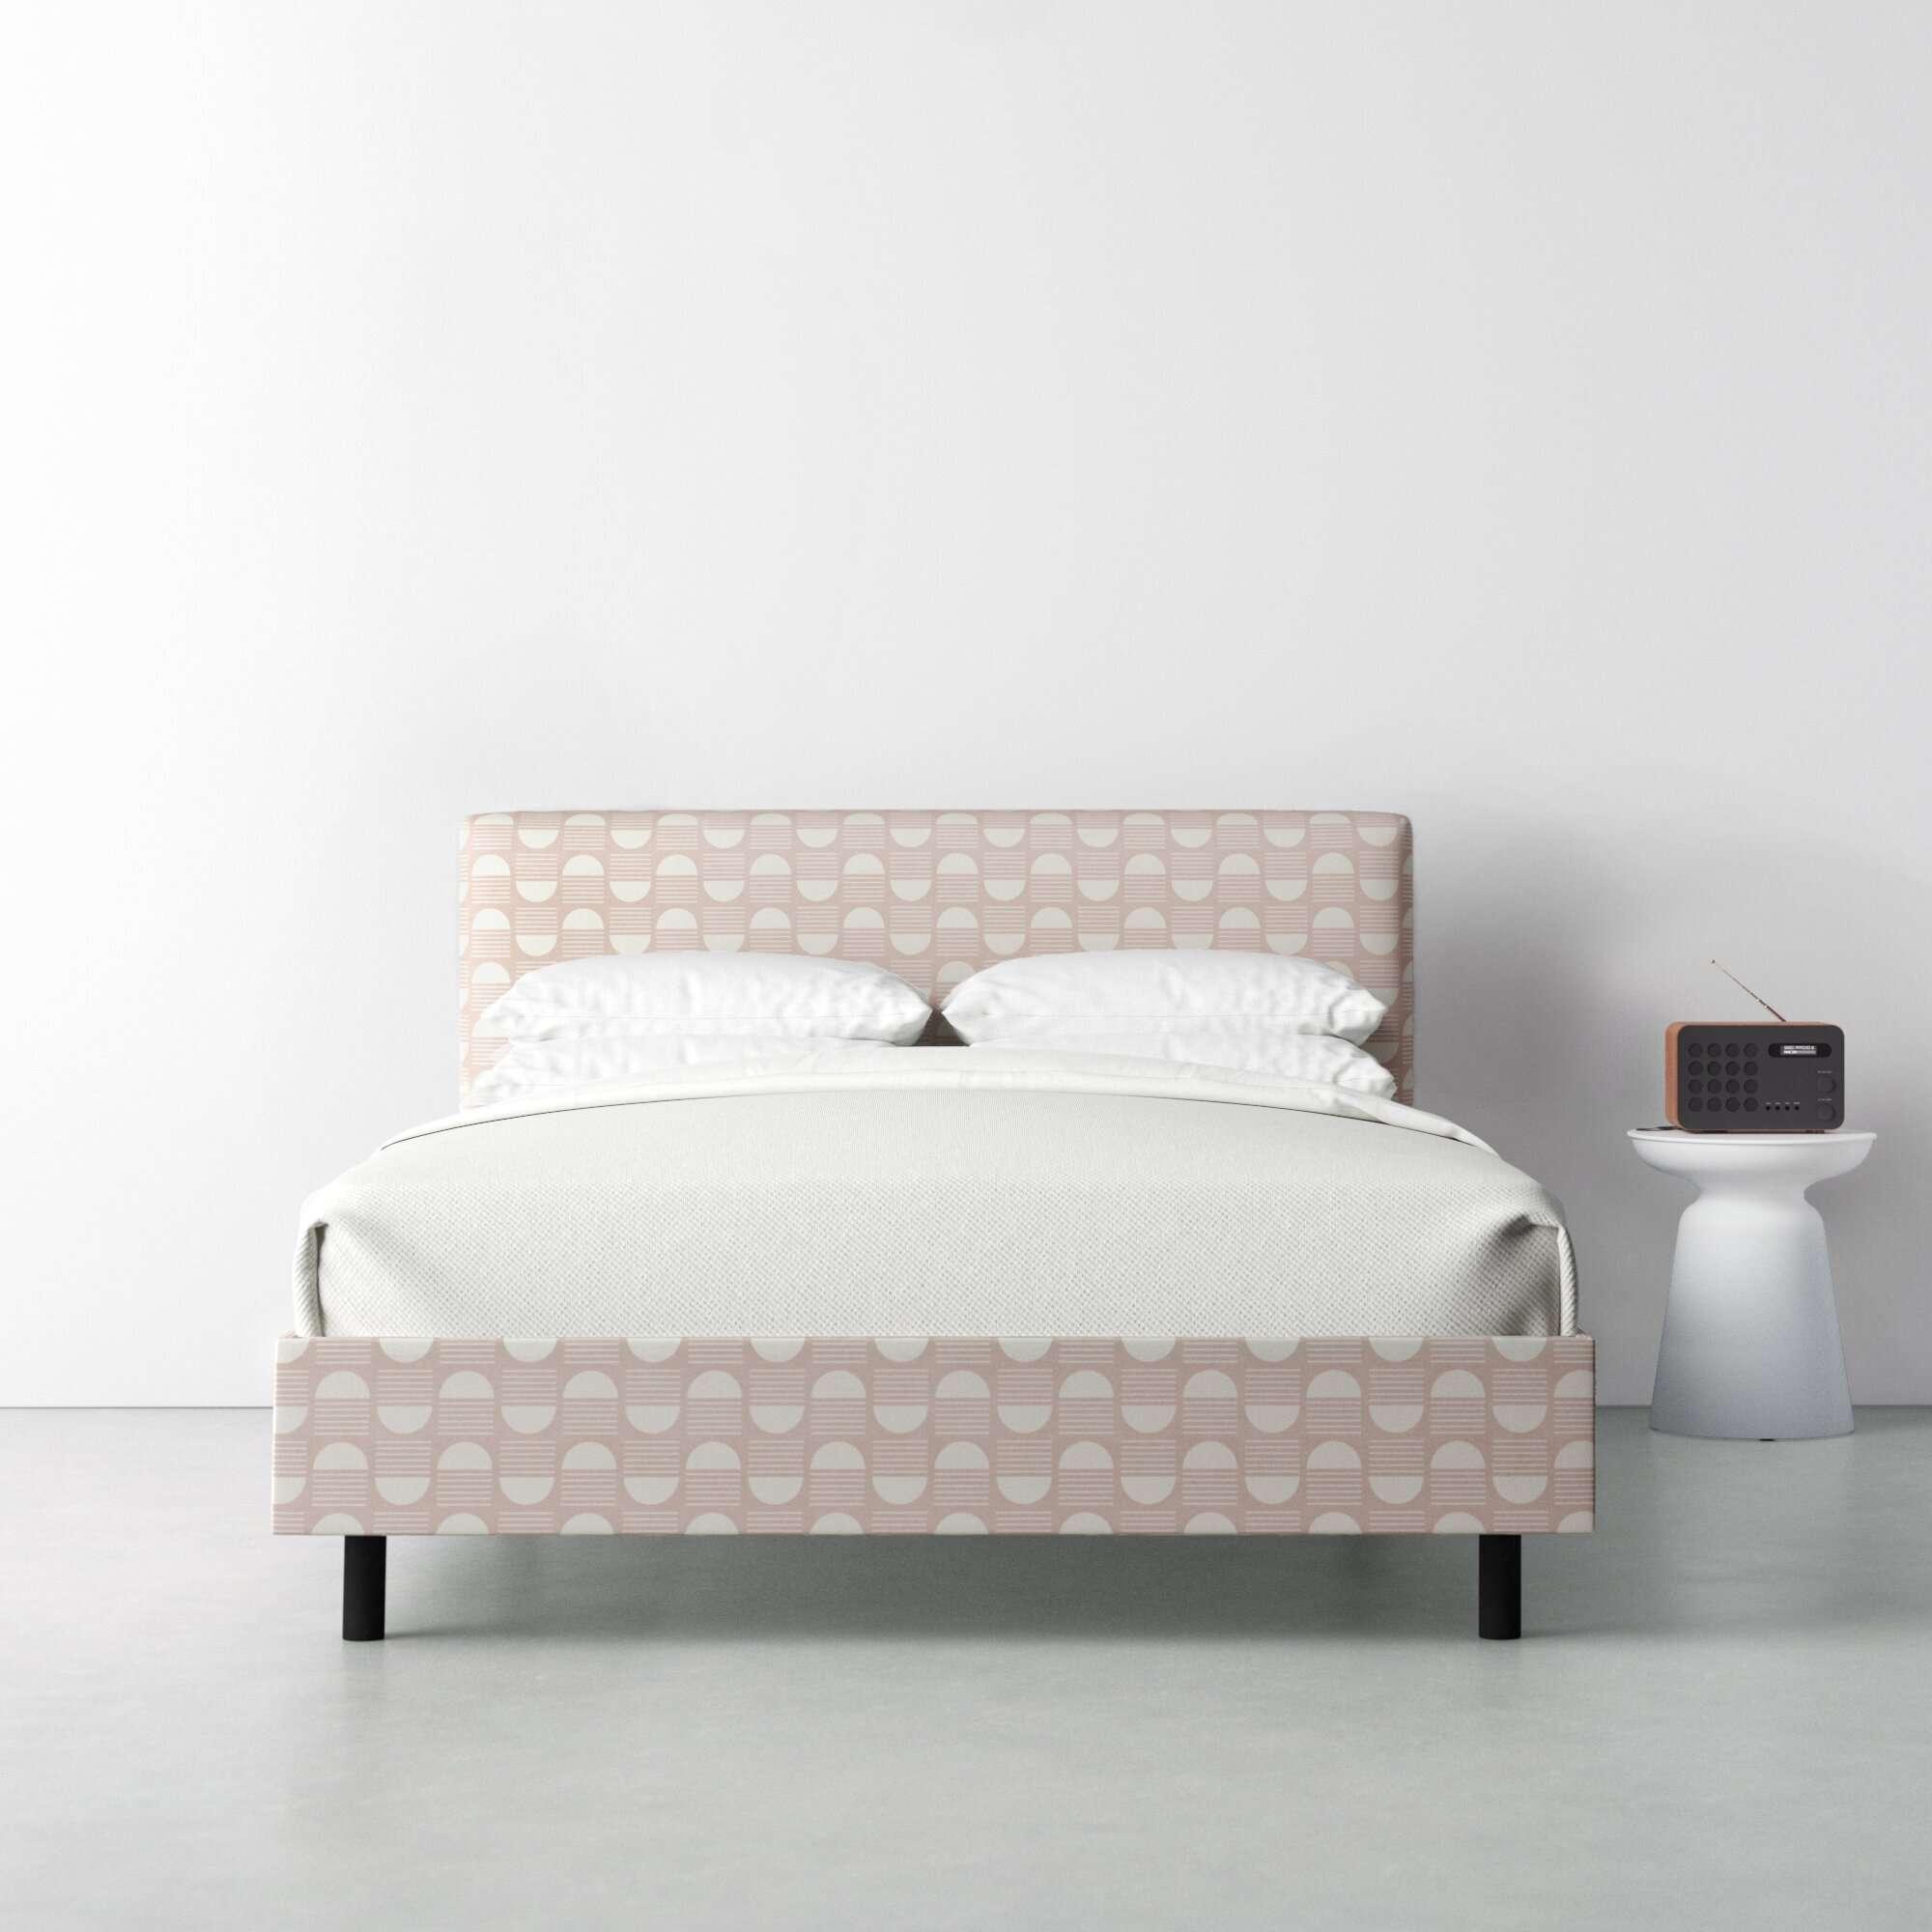 AllModern Kyree Upholstered Bed